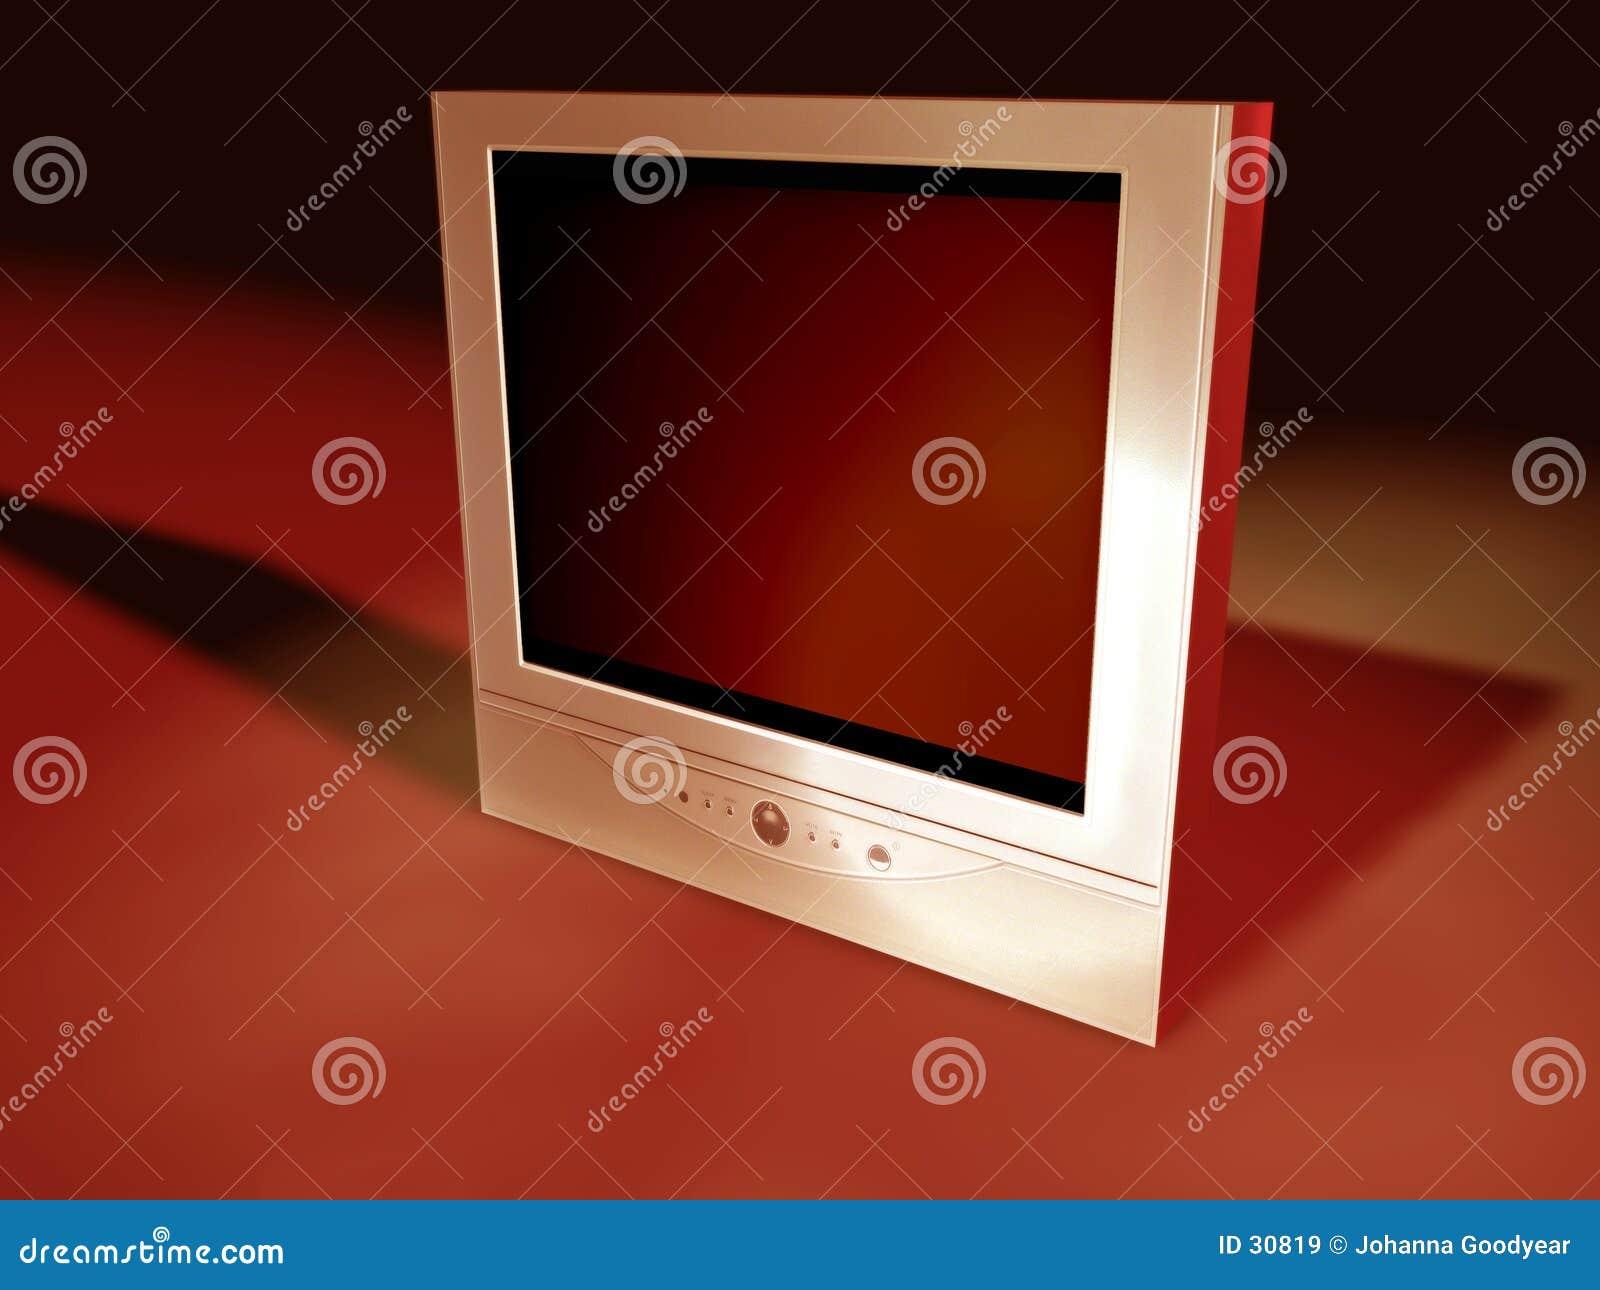 3 flatscreen TV